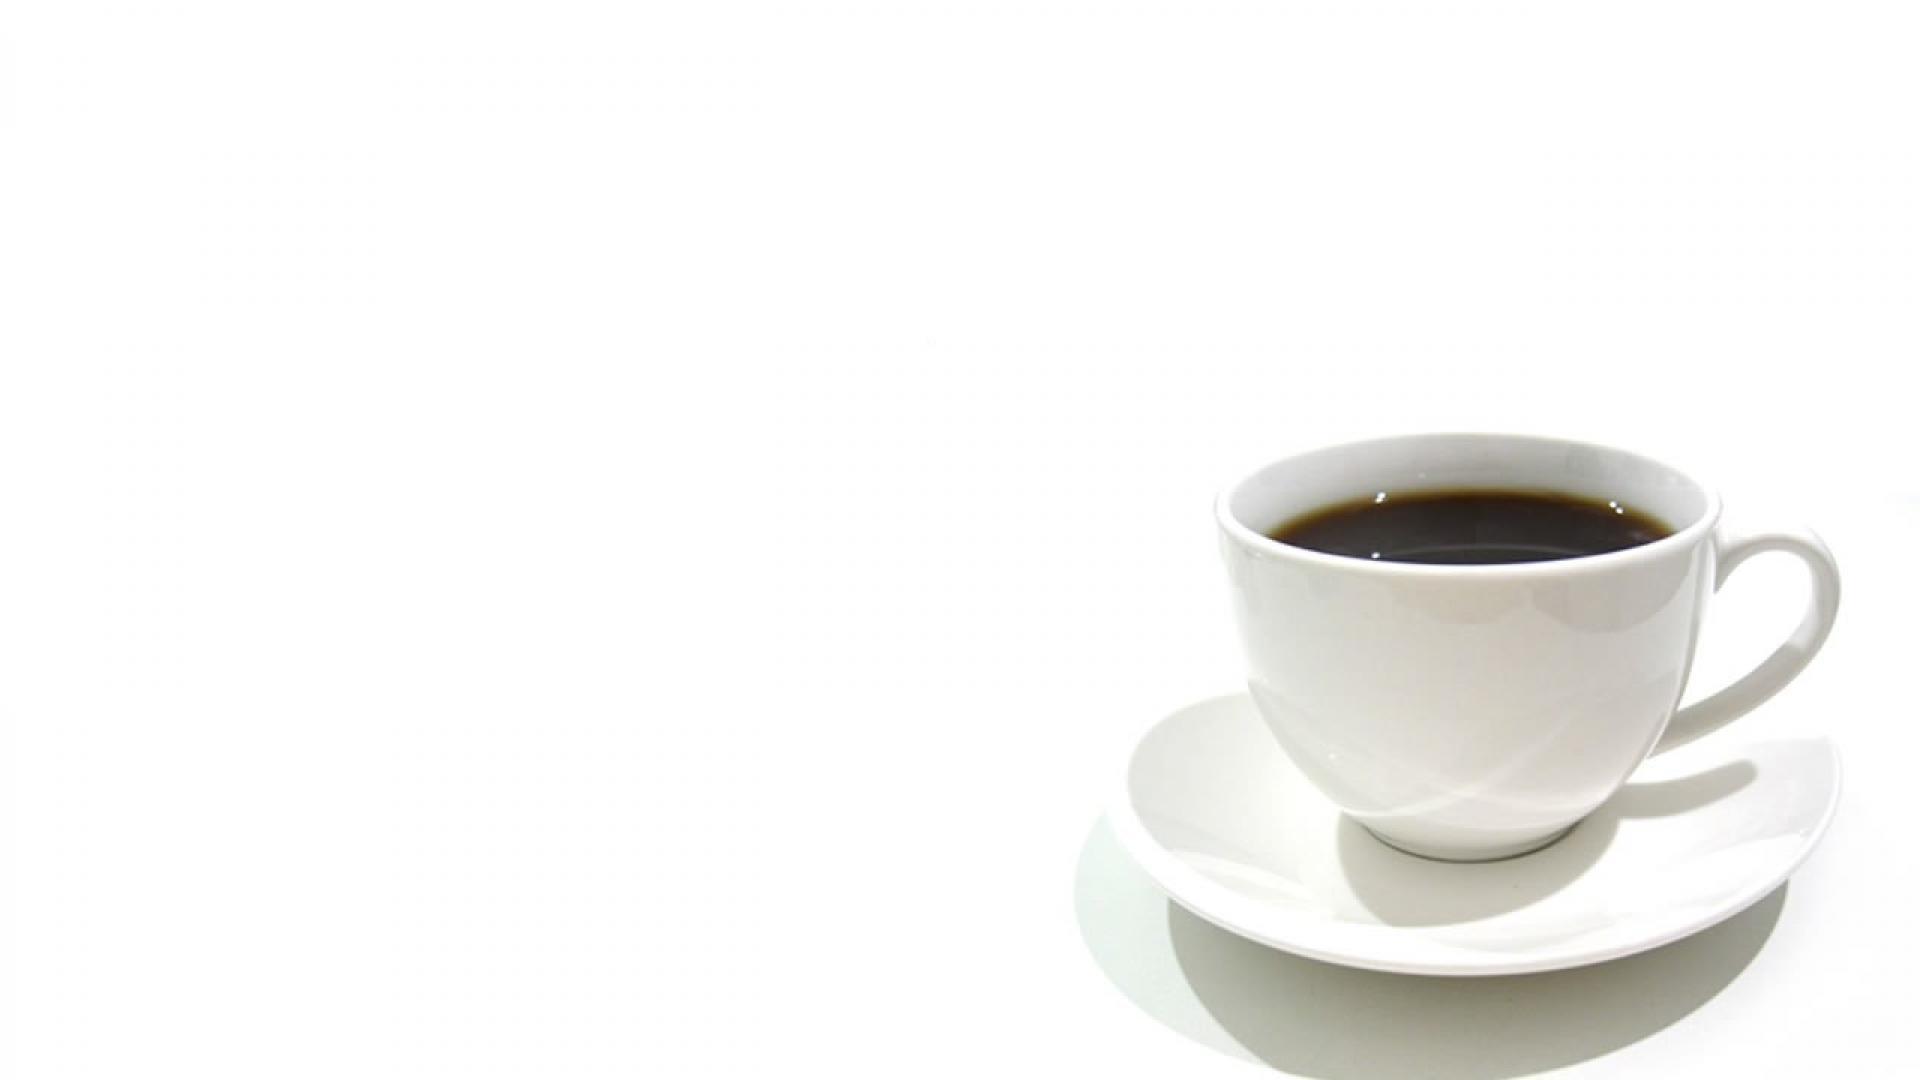 Alimento - Coffee  Sfondo